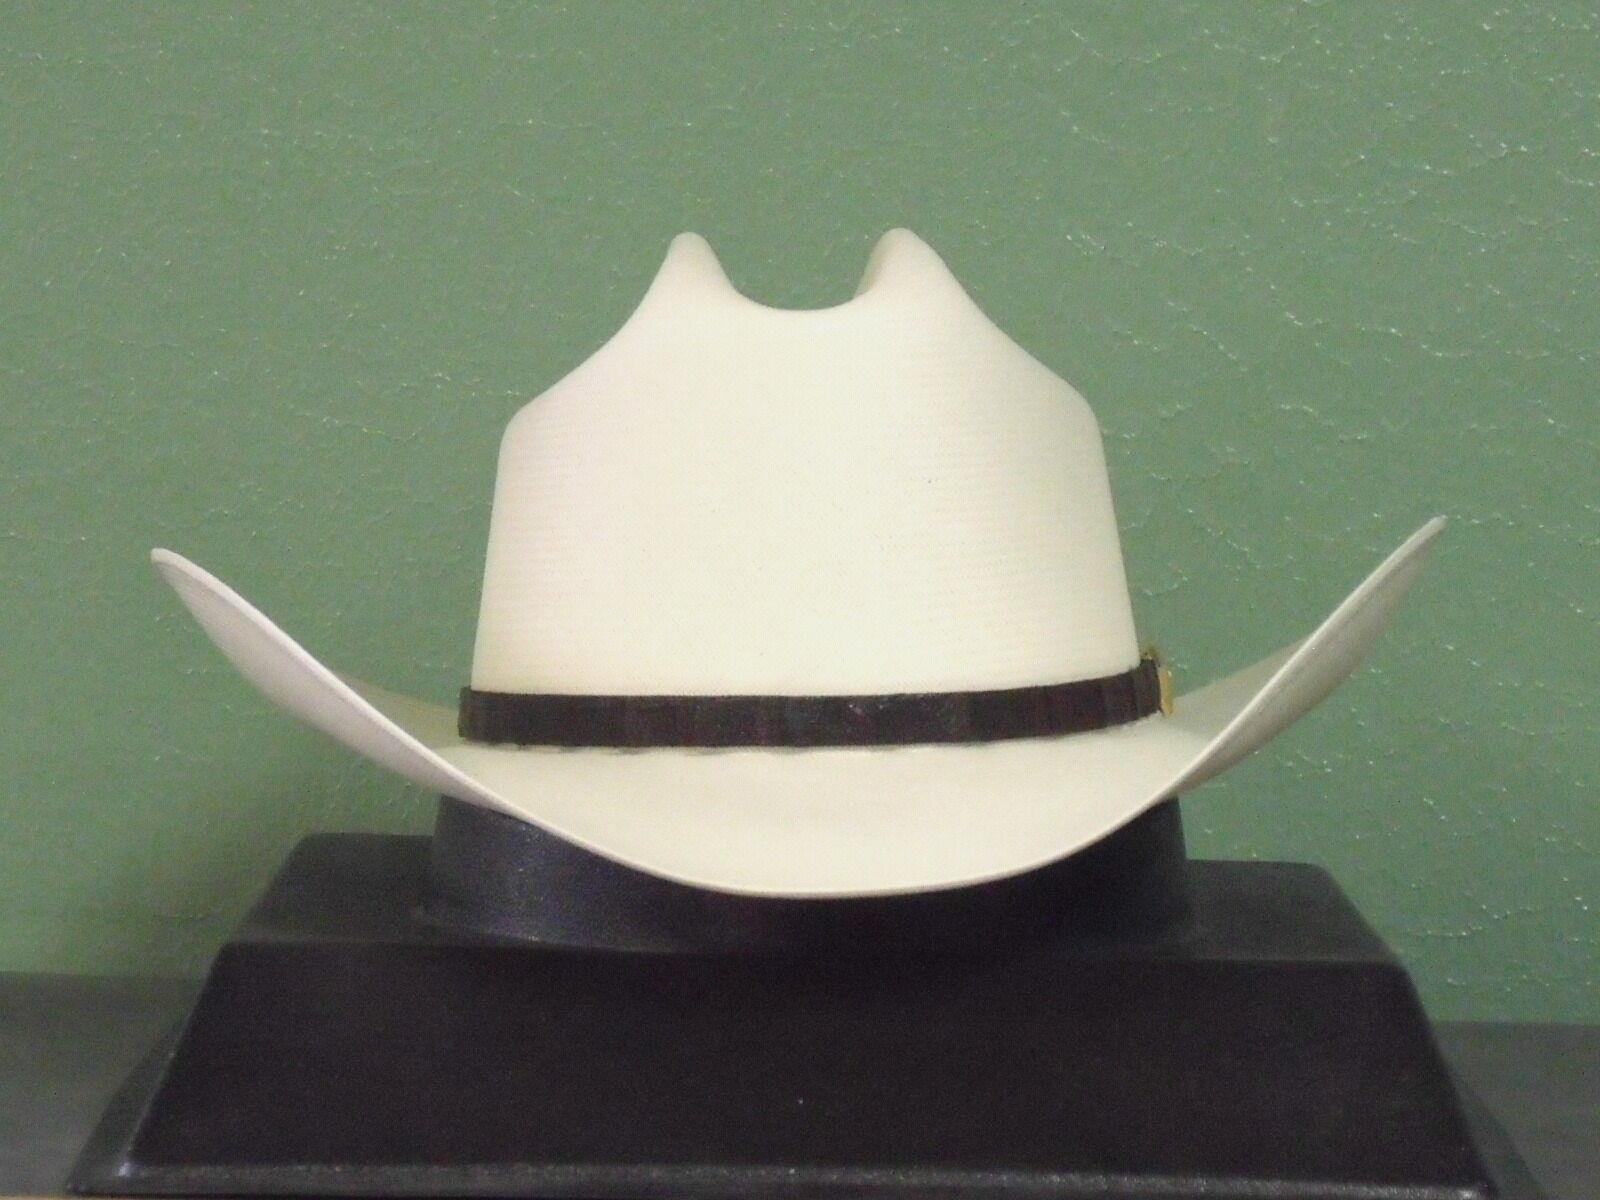 Buy Stetson Evilla De ORO 1000x Straw Cowboy Hat - Ssevor-3140 7 1 8 ... bf03836419f